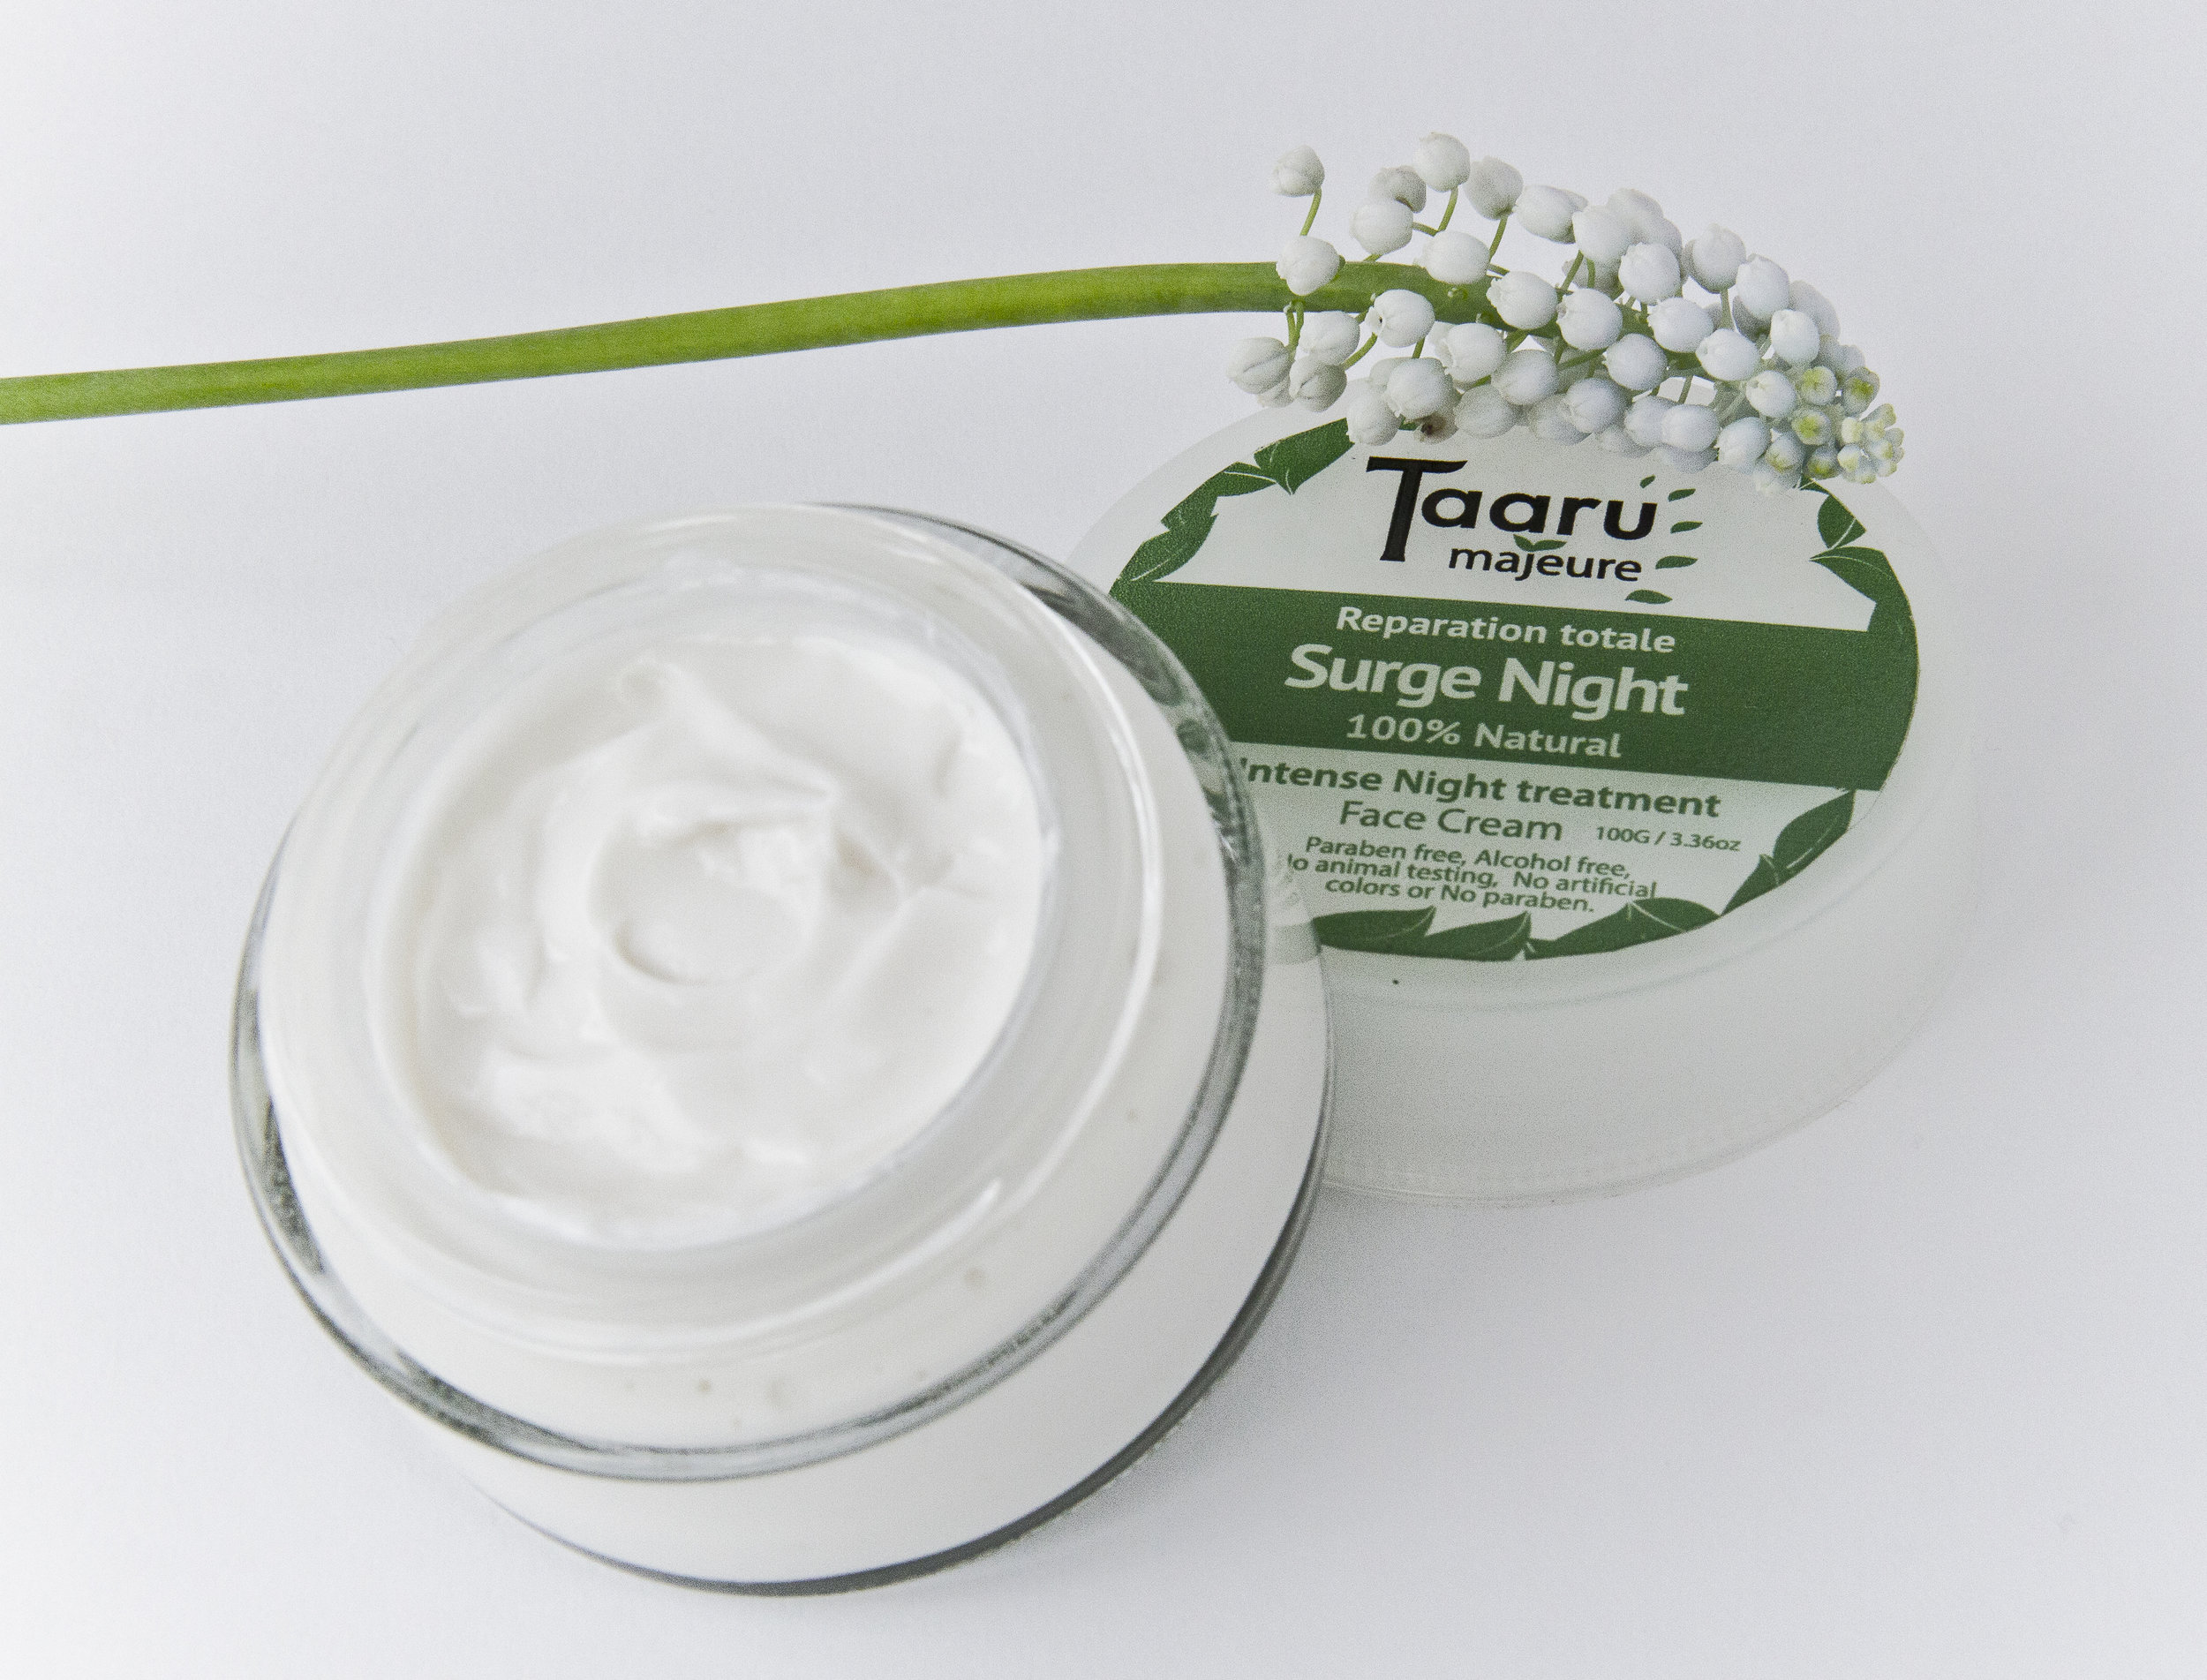 Intense Treatment Surge Night Face Cream